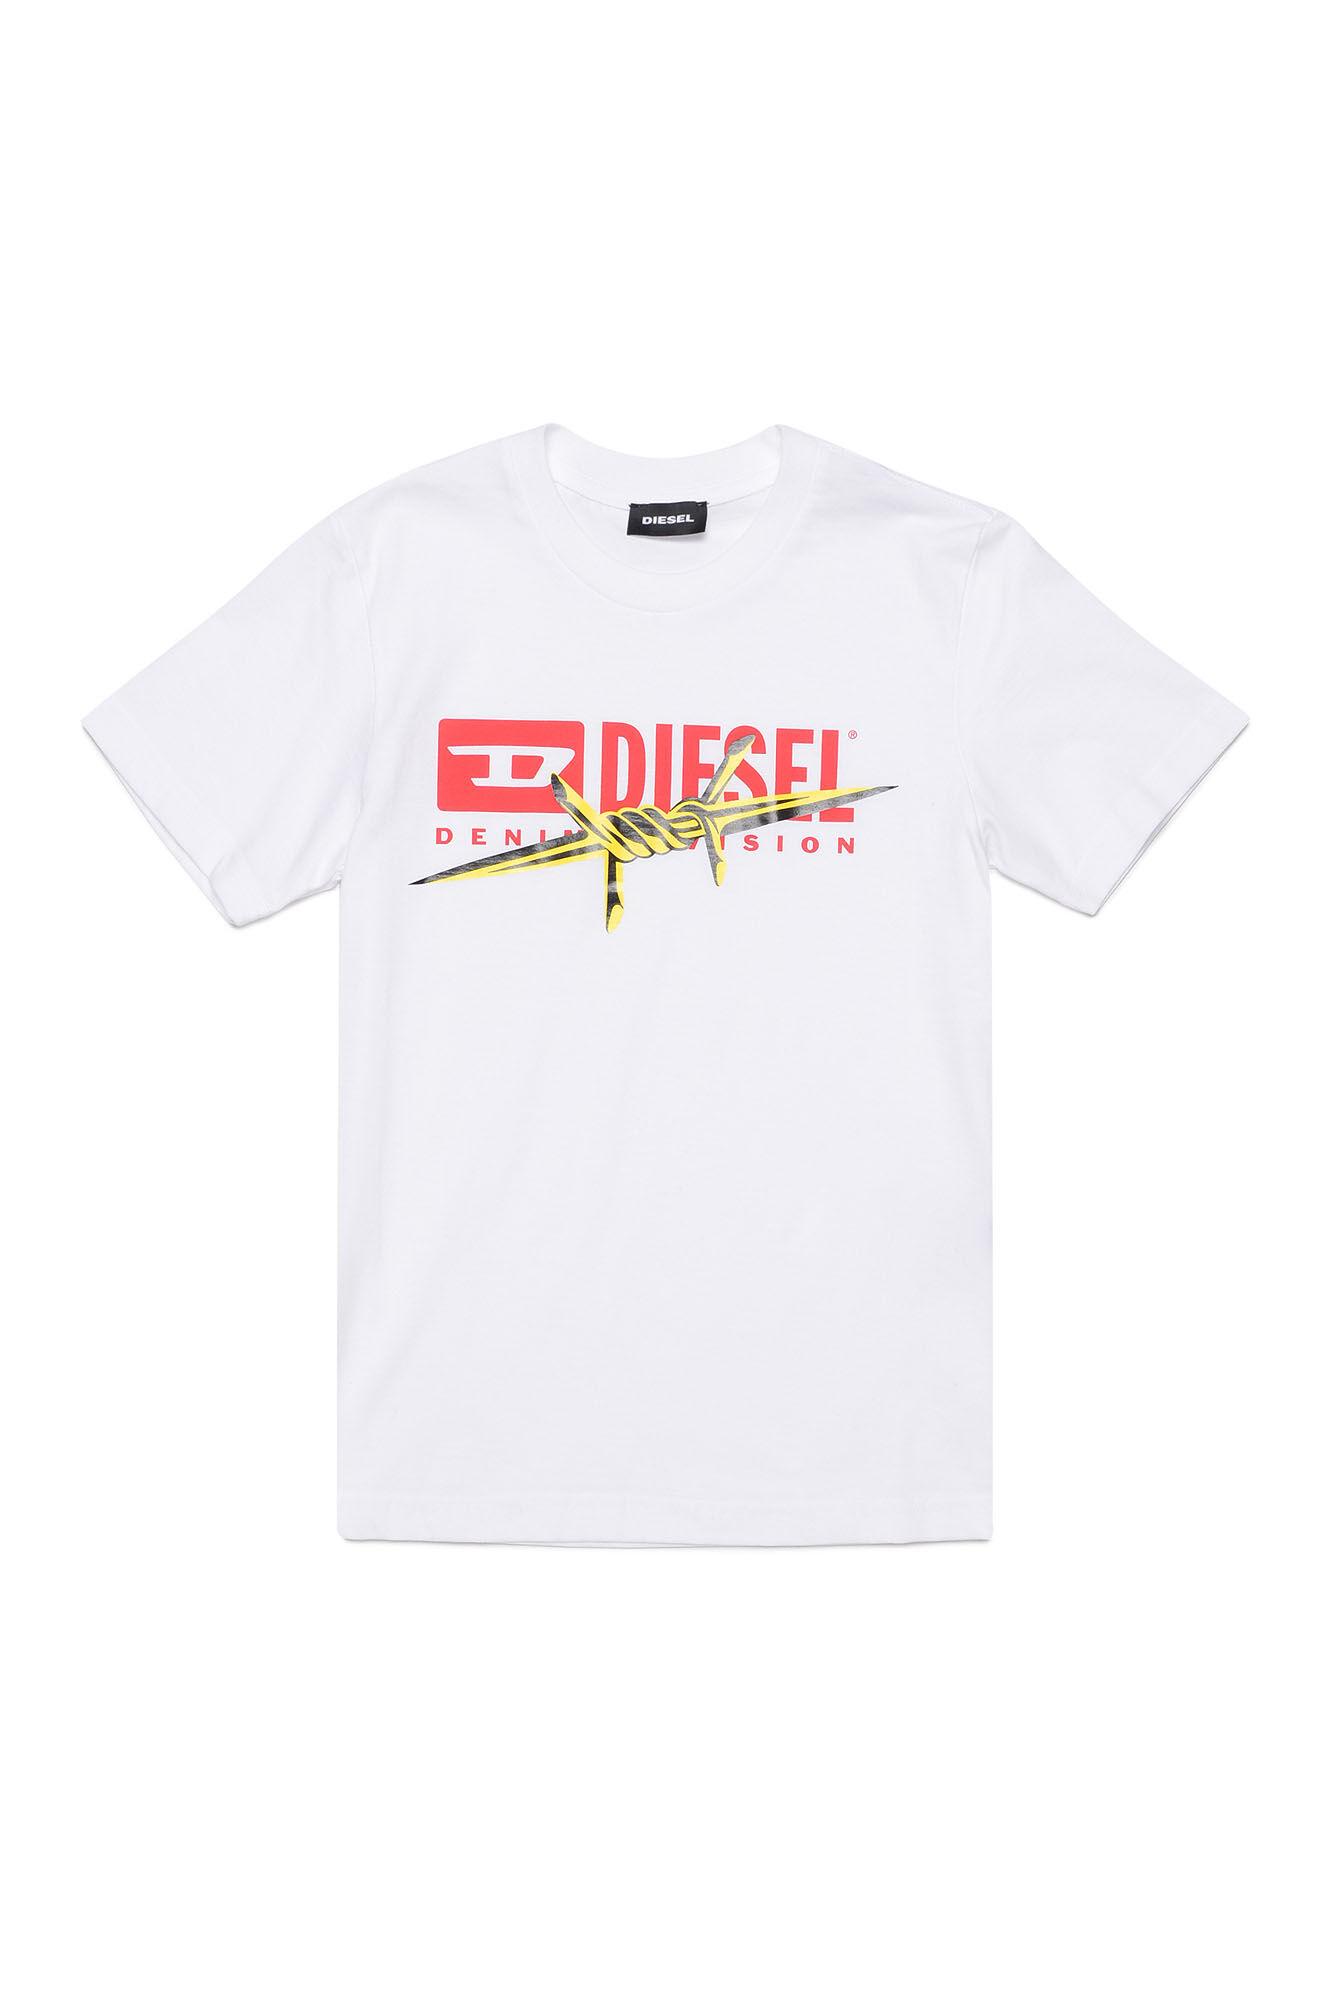 Tdiegobx2 Maglietta - Diesel Kid